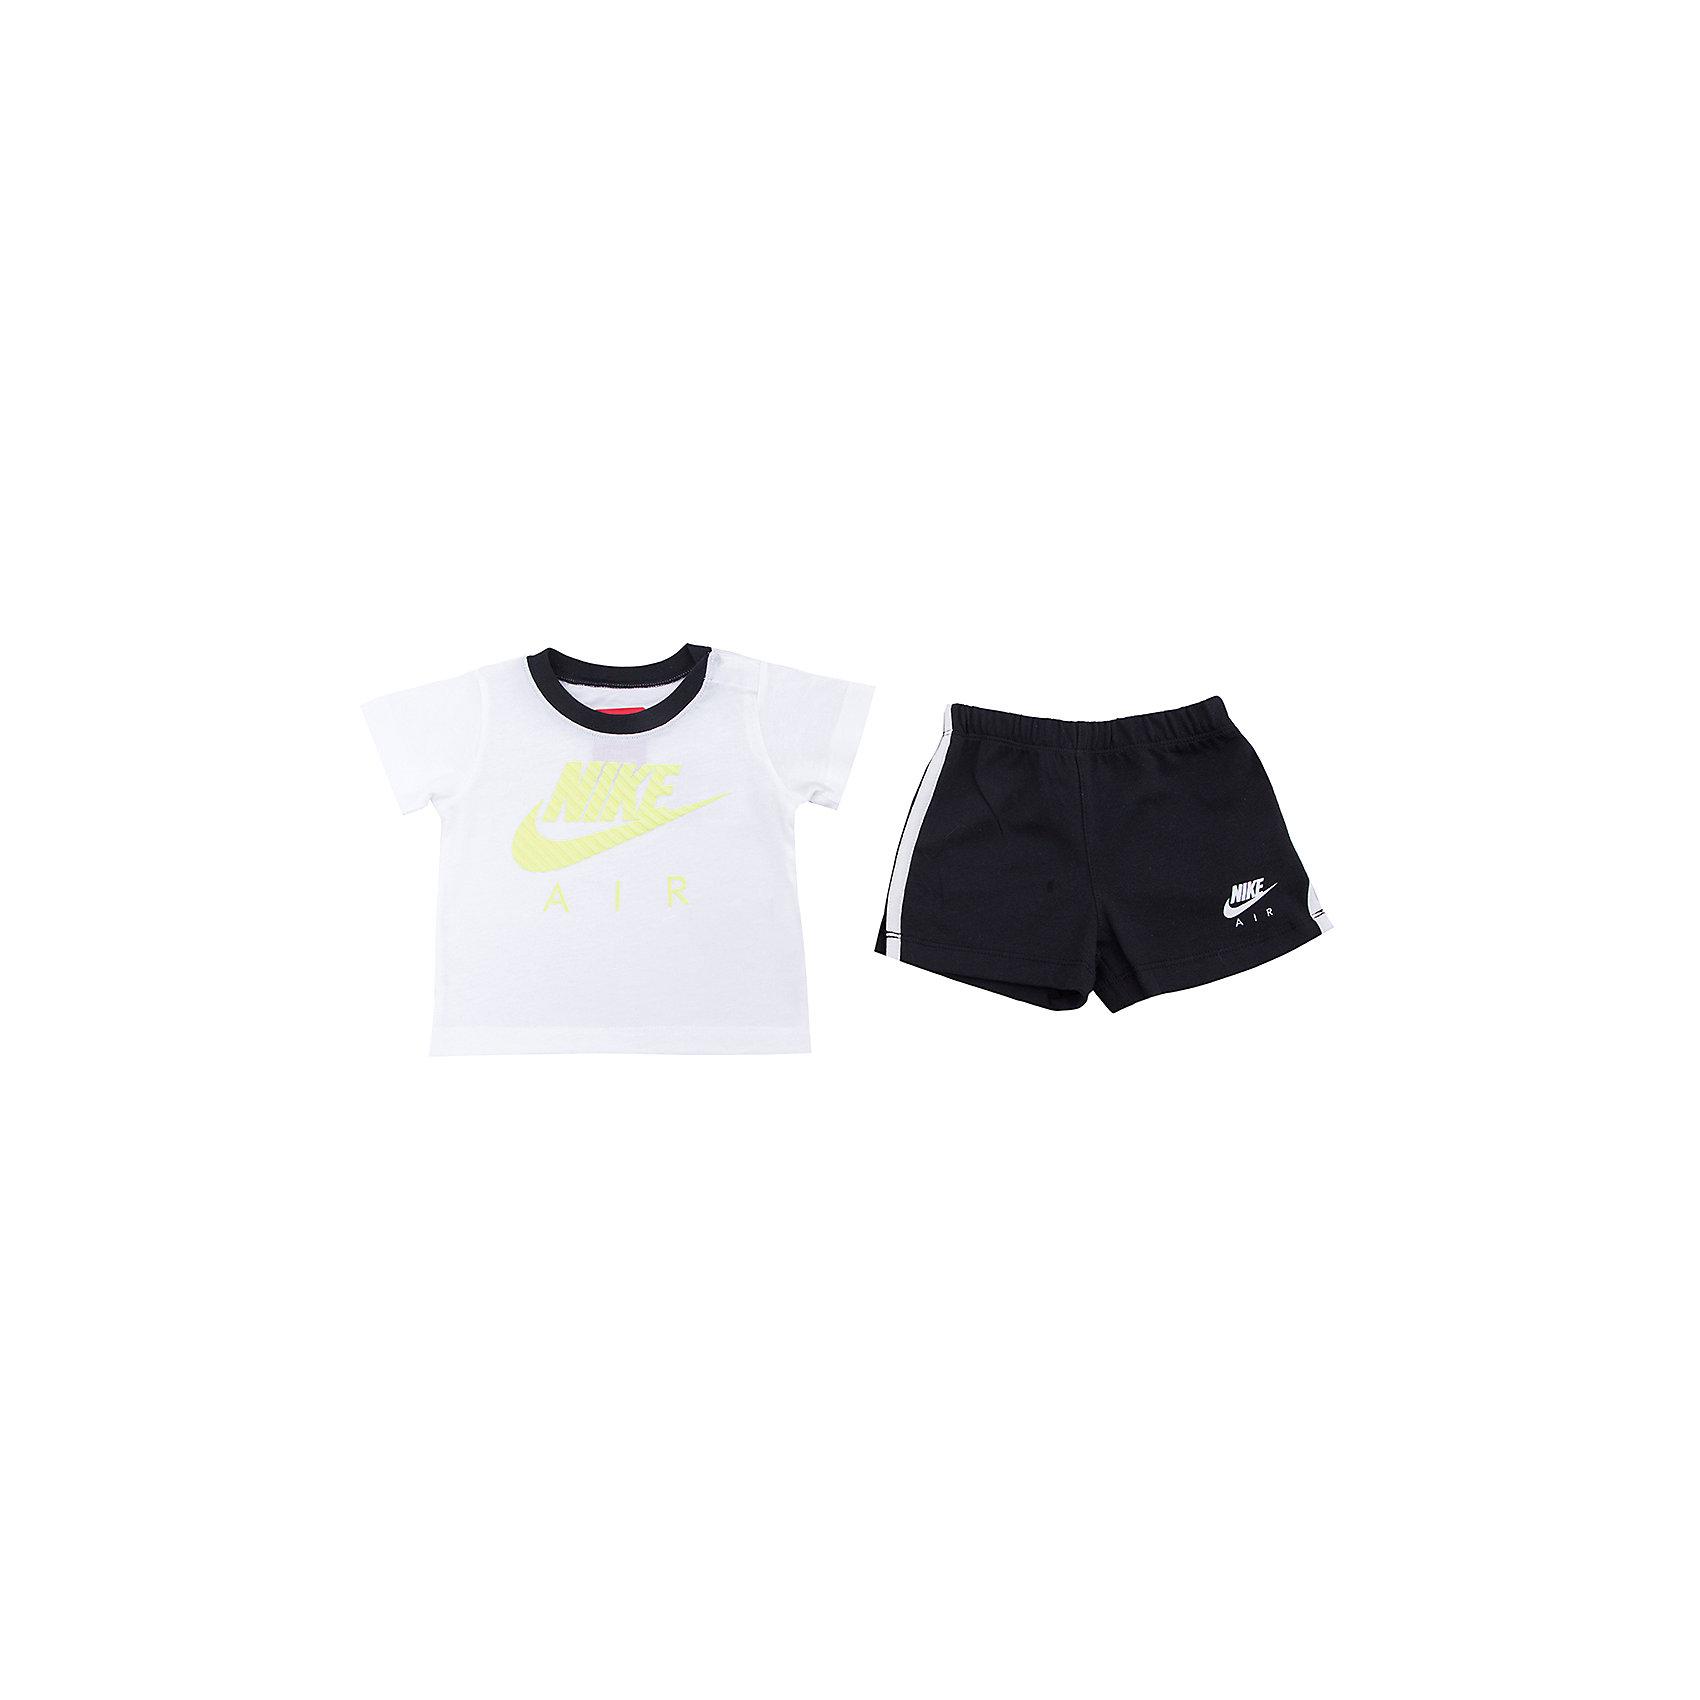 NIKE Комплект для мальчика: футболка и шорты HBR MIXED SET INF NIKE